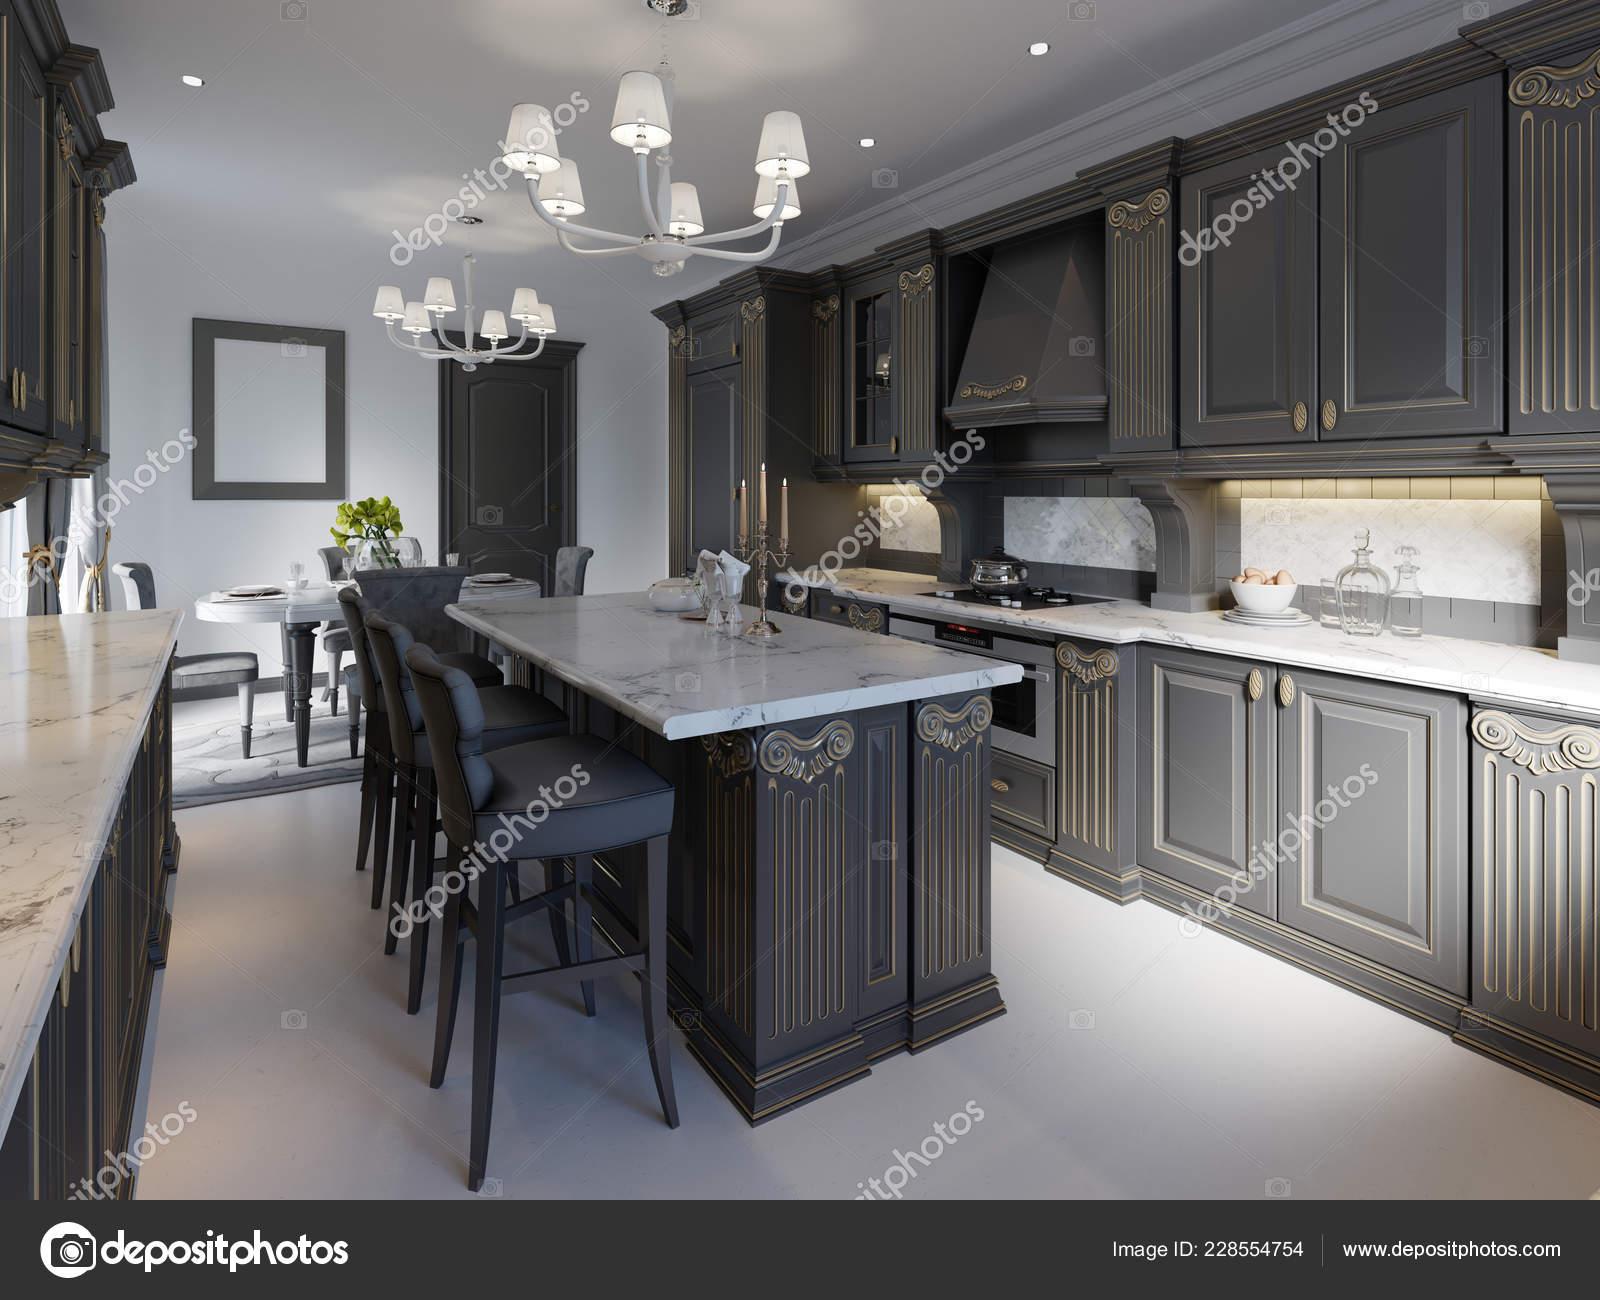 Modern Classic Kitchen Design Black Cabinets White Marble Worktop Floor Stock Photo C Kuprin33 228554754